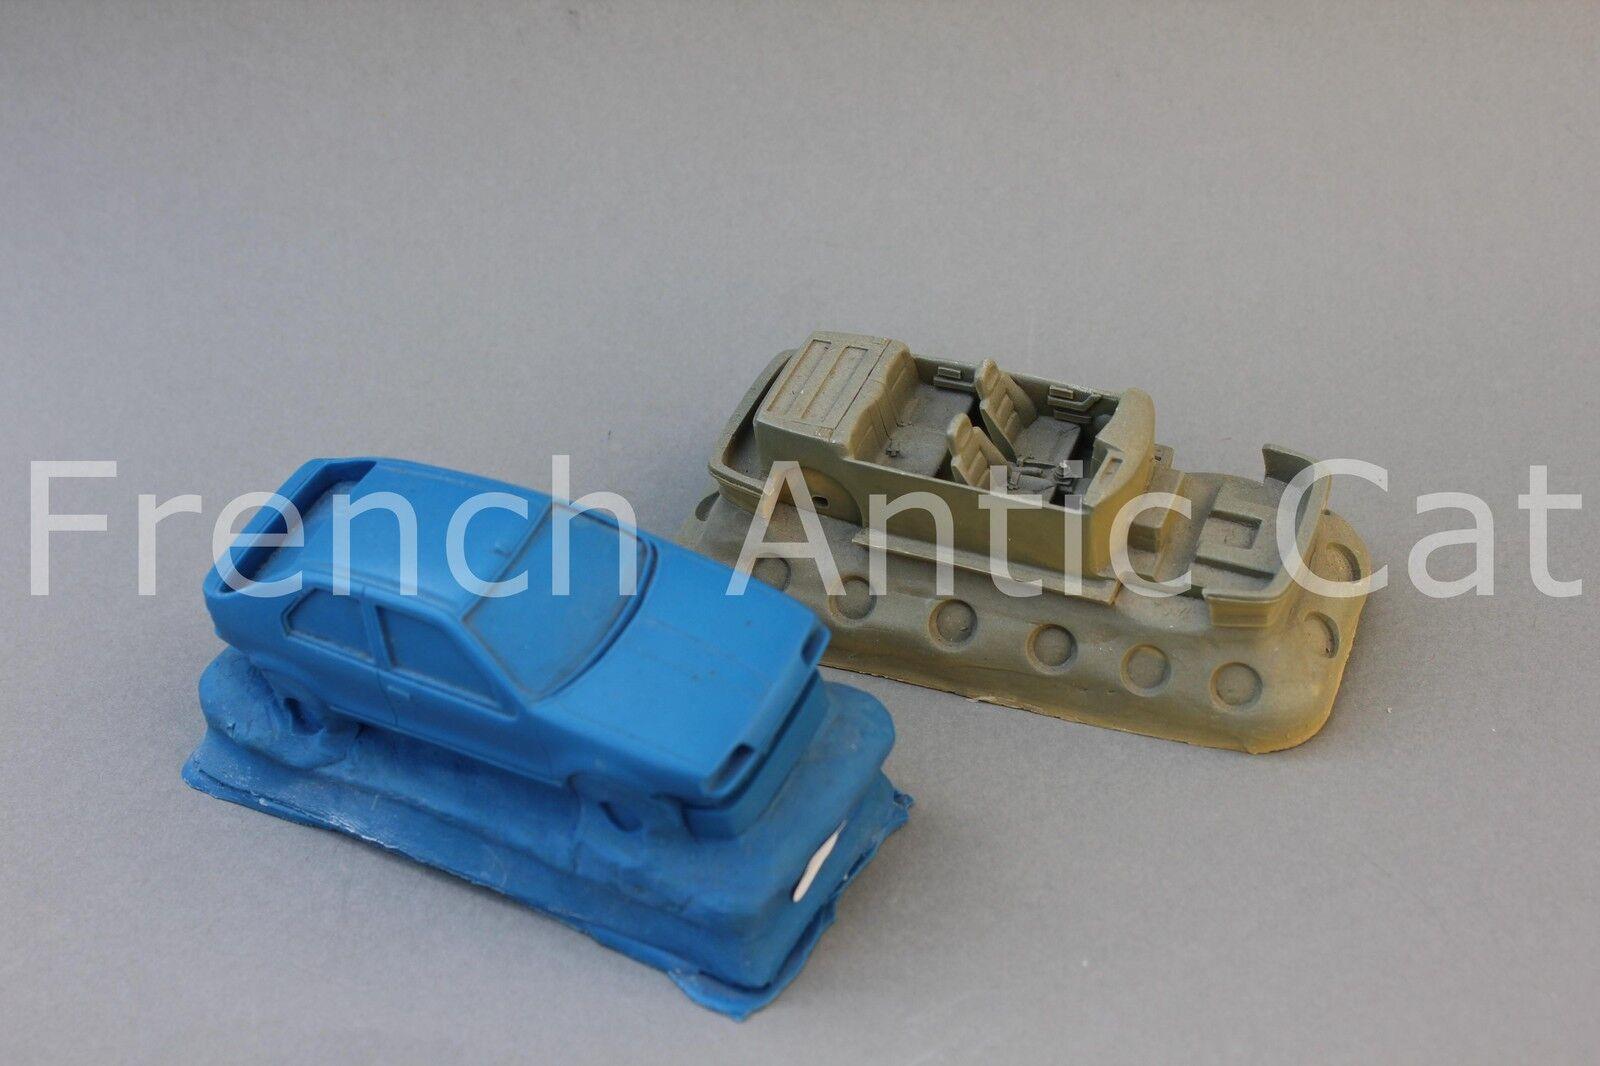 Rare matrix mould resin renault 19 phase 1 4 door 1 43 heco models mj